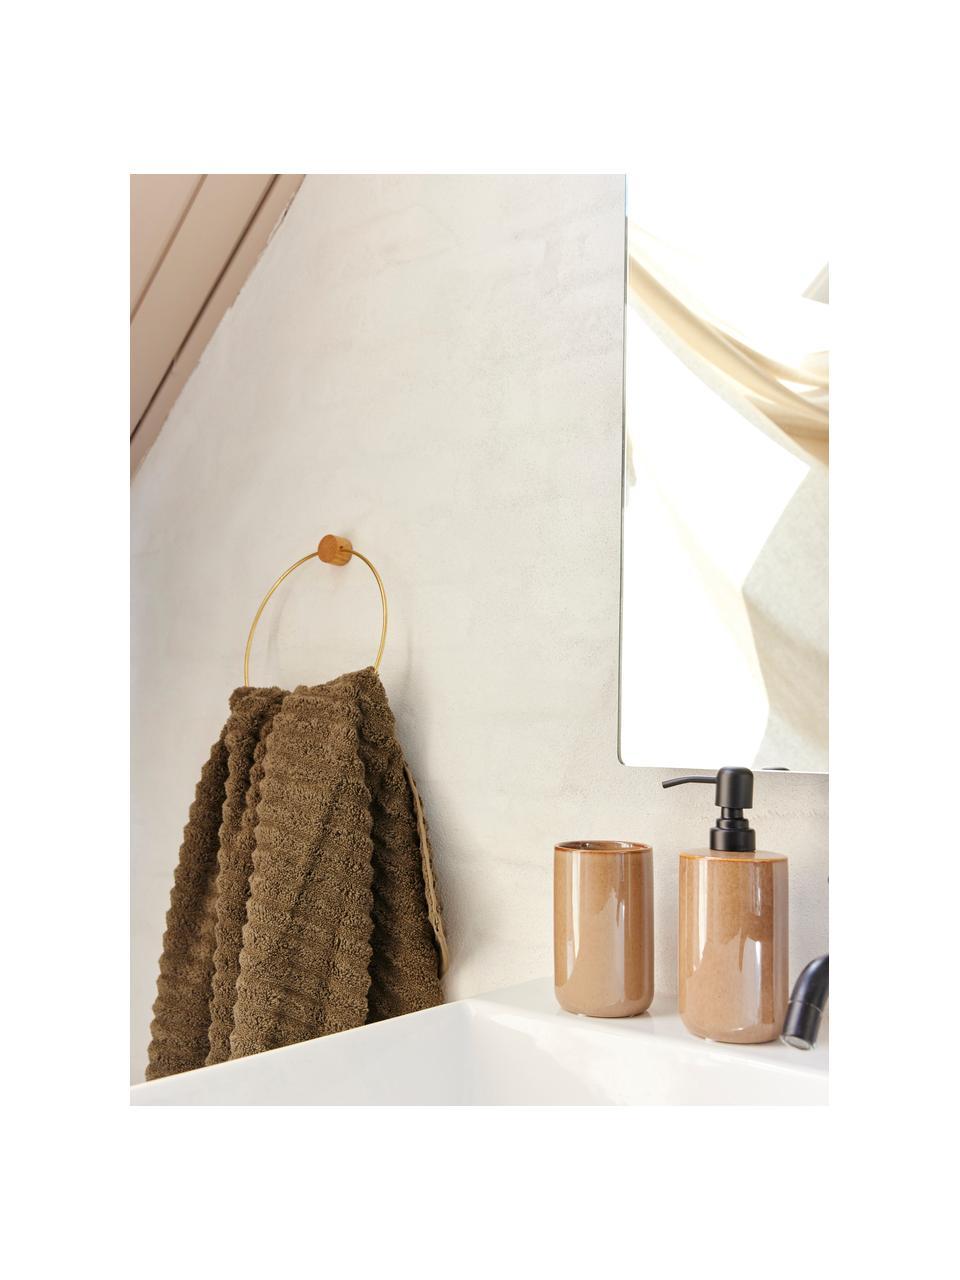 Keramische zeepdispenser Tin in bruin, Houder: keramiek, Bruin, zwart, Ø 8 x H 13 cm